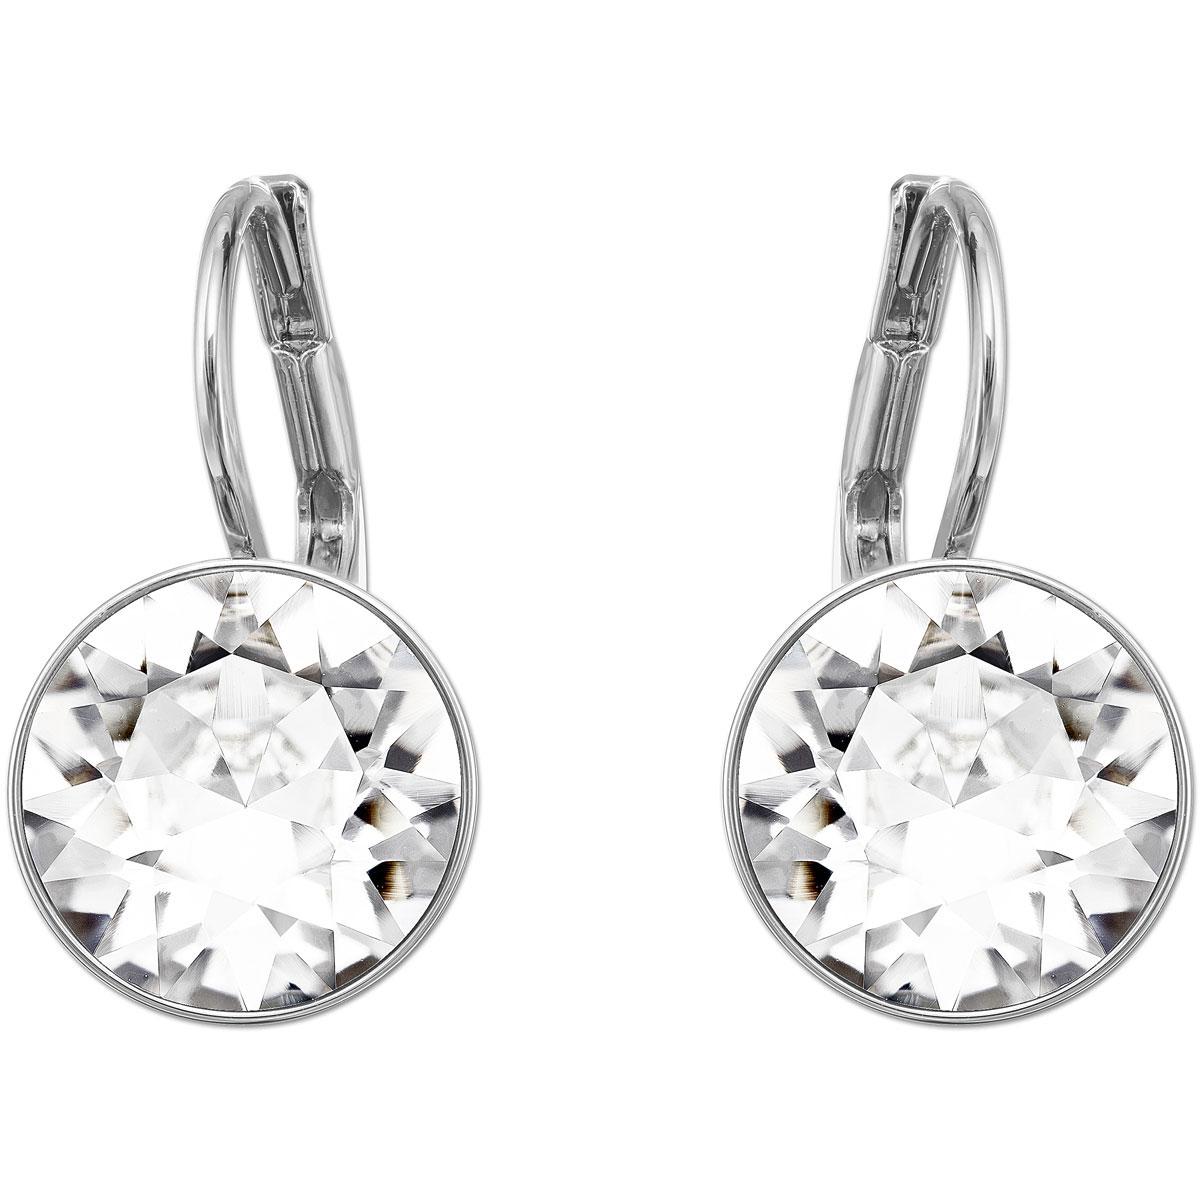 Swarovski Bella Mini Earrings, White, Rhodium